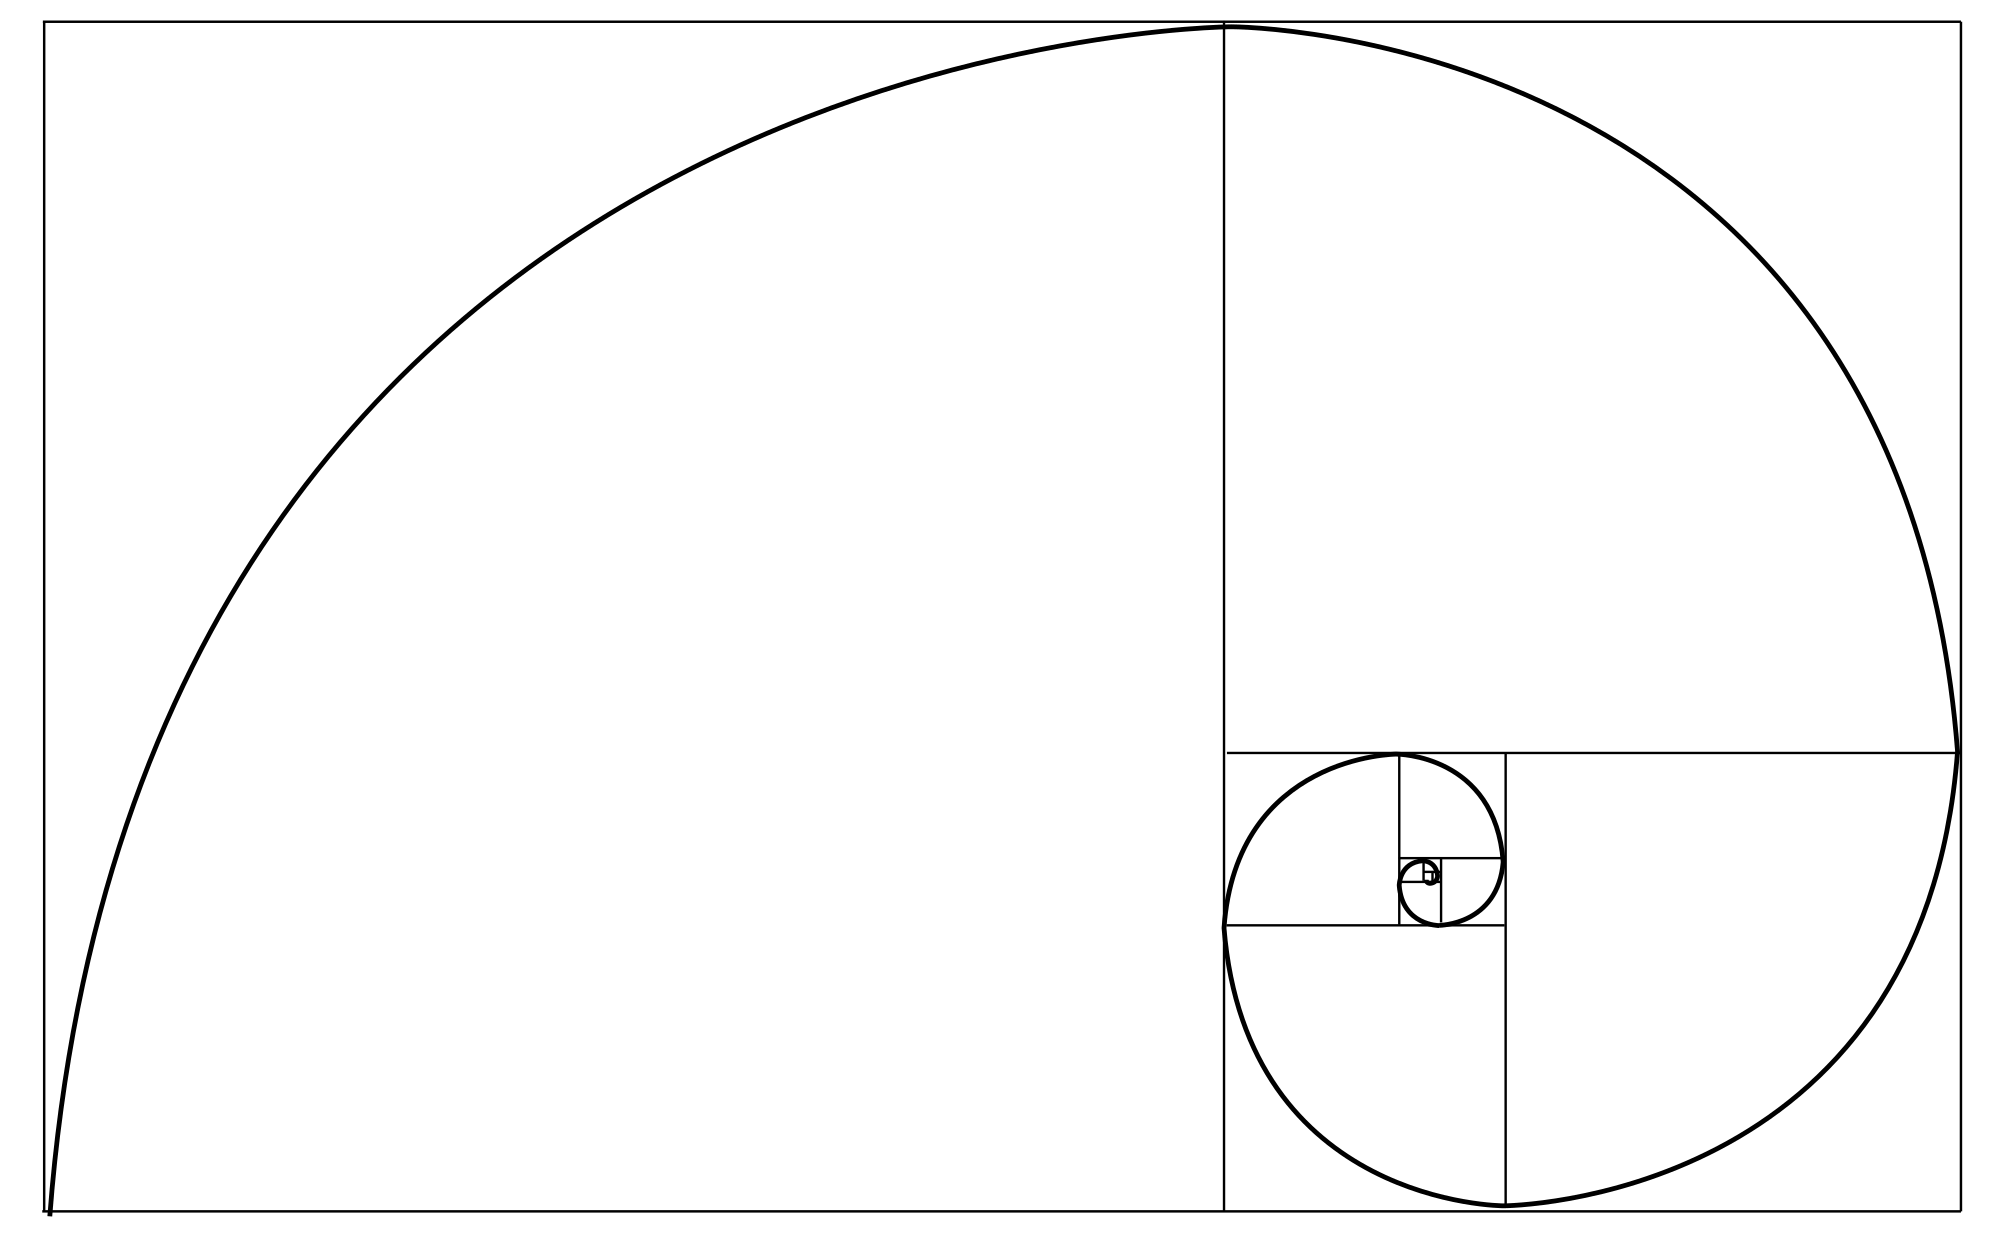 the golden ratio png templates david hodder